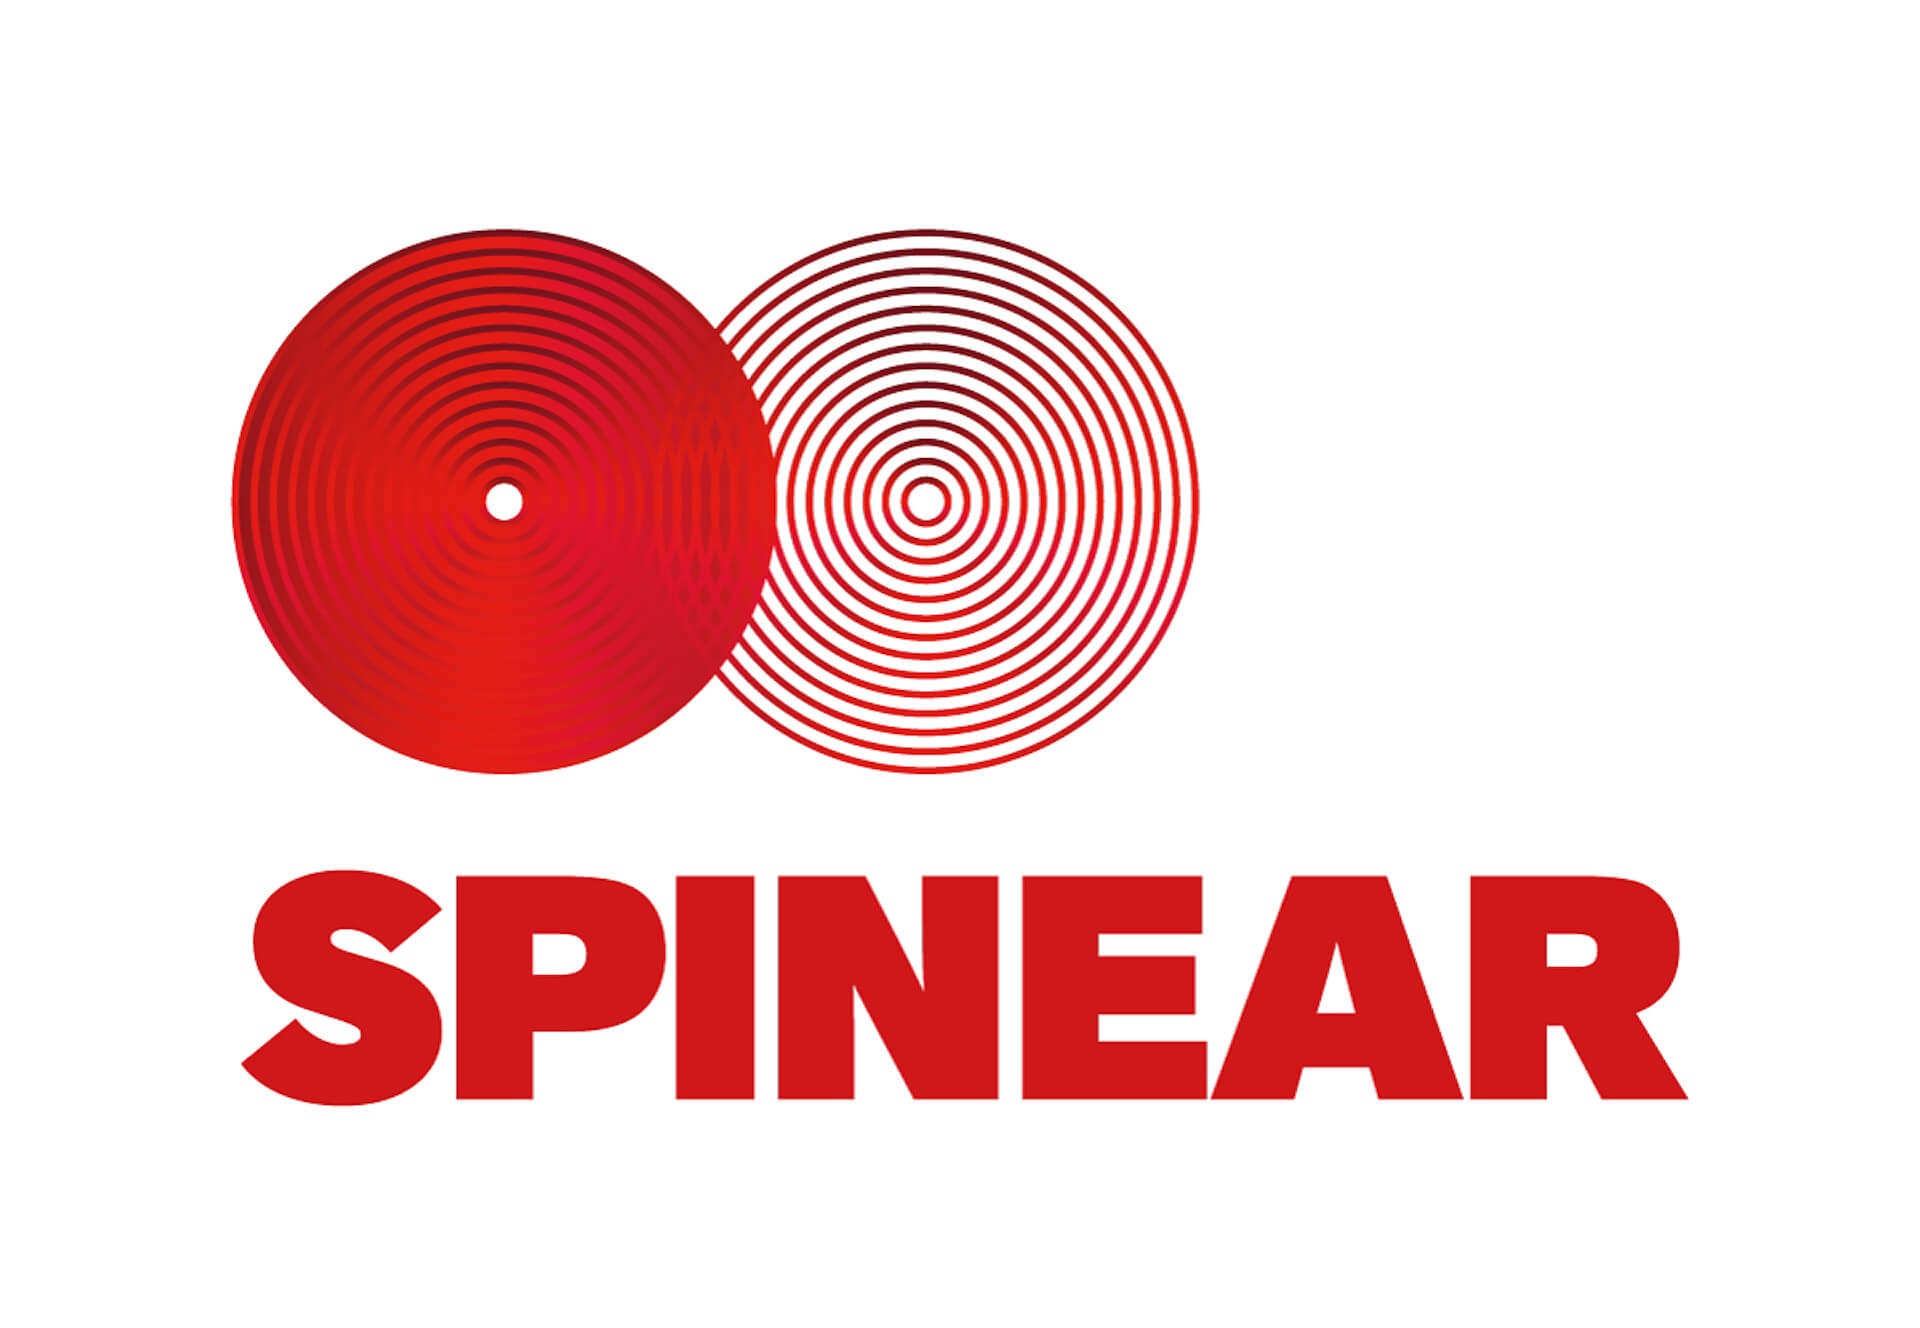 JAVEによるデジタル音声コンテンツ配信サービス「SPINEAR」β版がスタート!アジカン・後藤正文やのんが出演するオリジナルコンテンツも ac200408_spinear_01